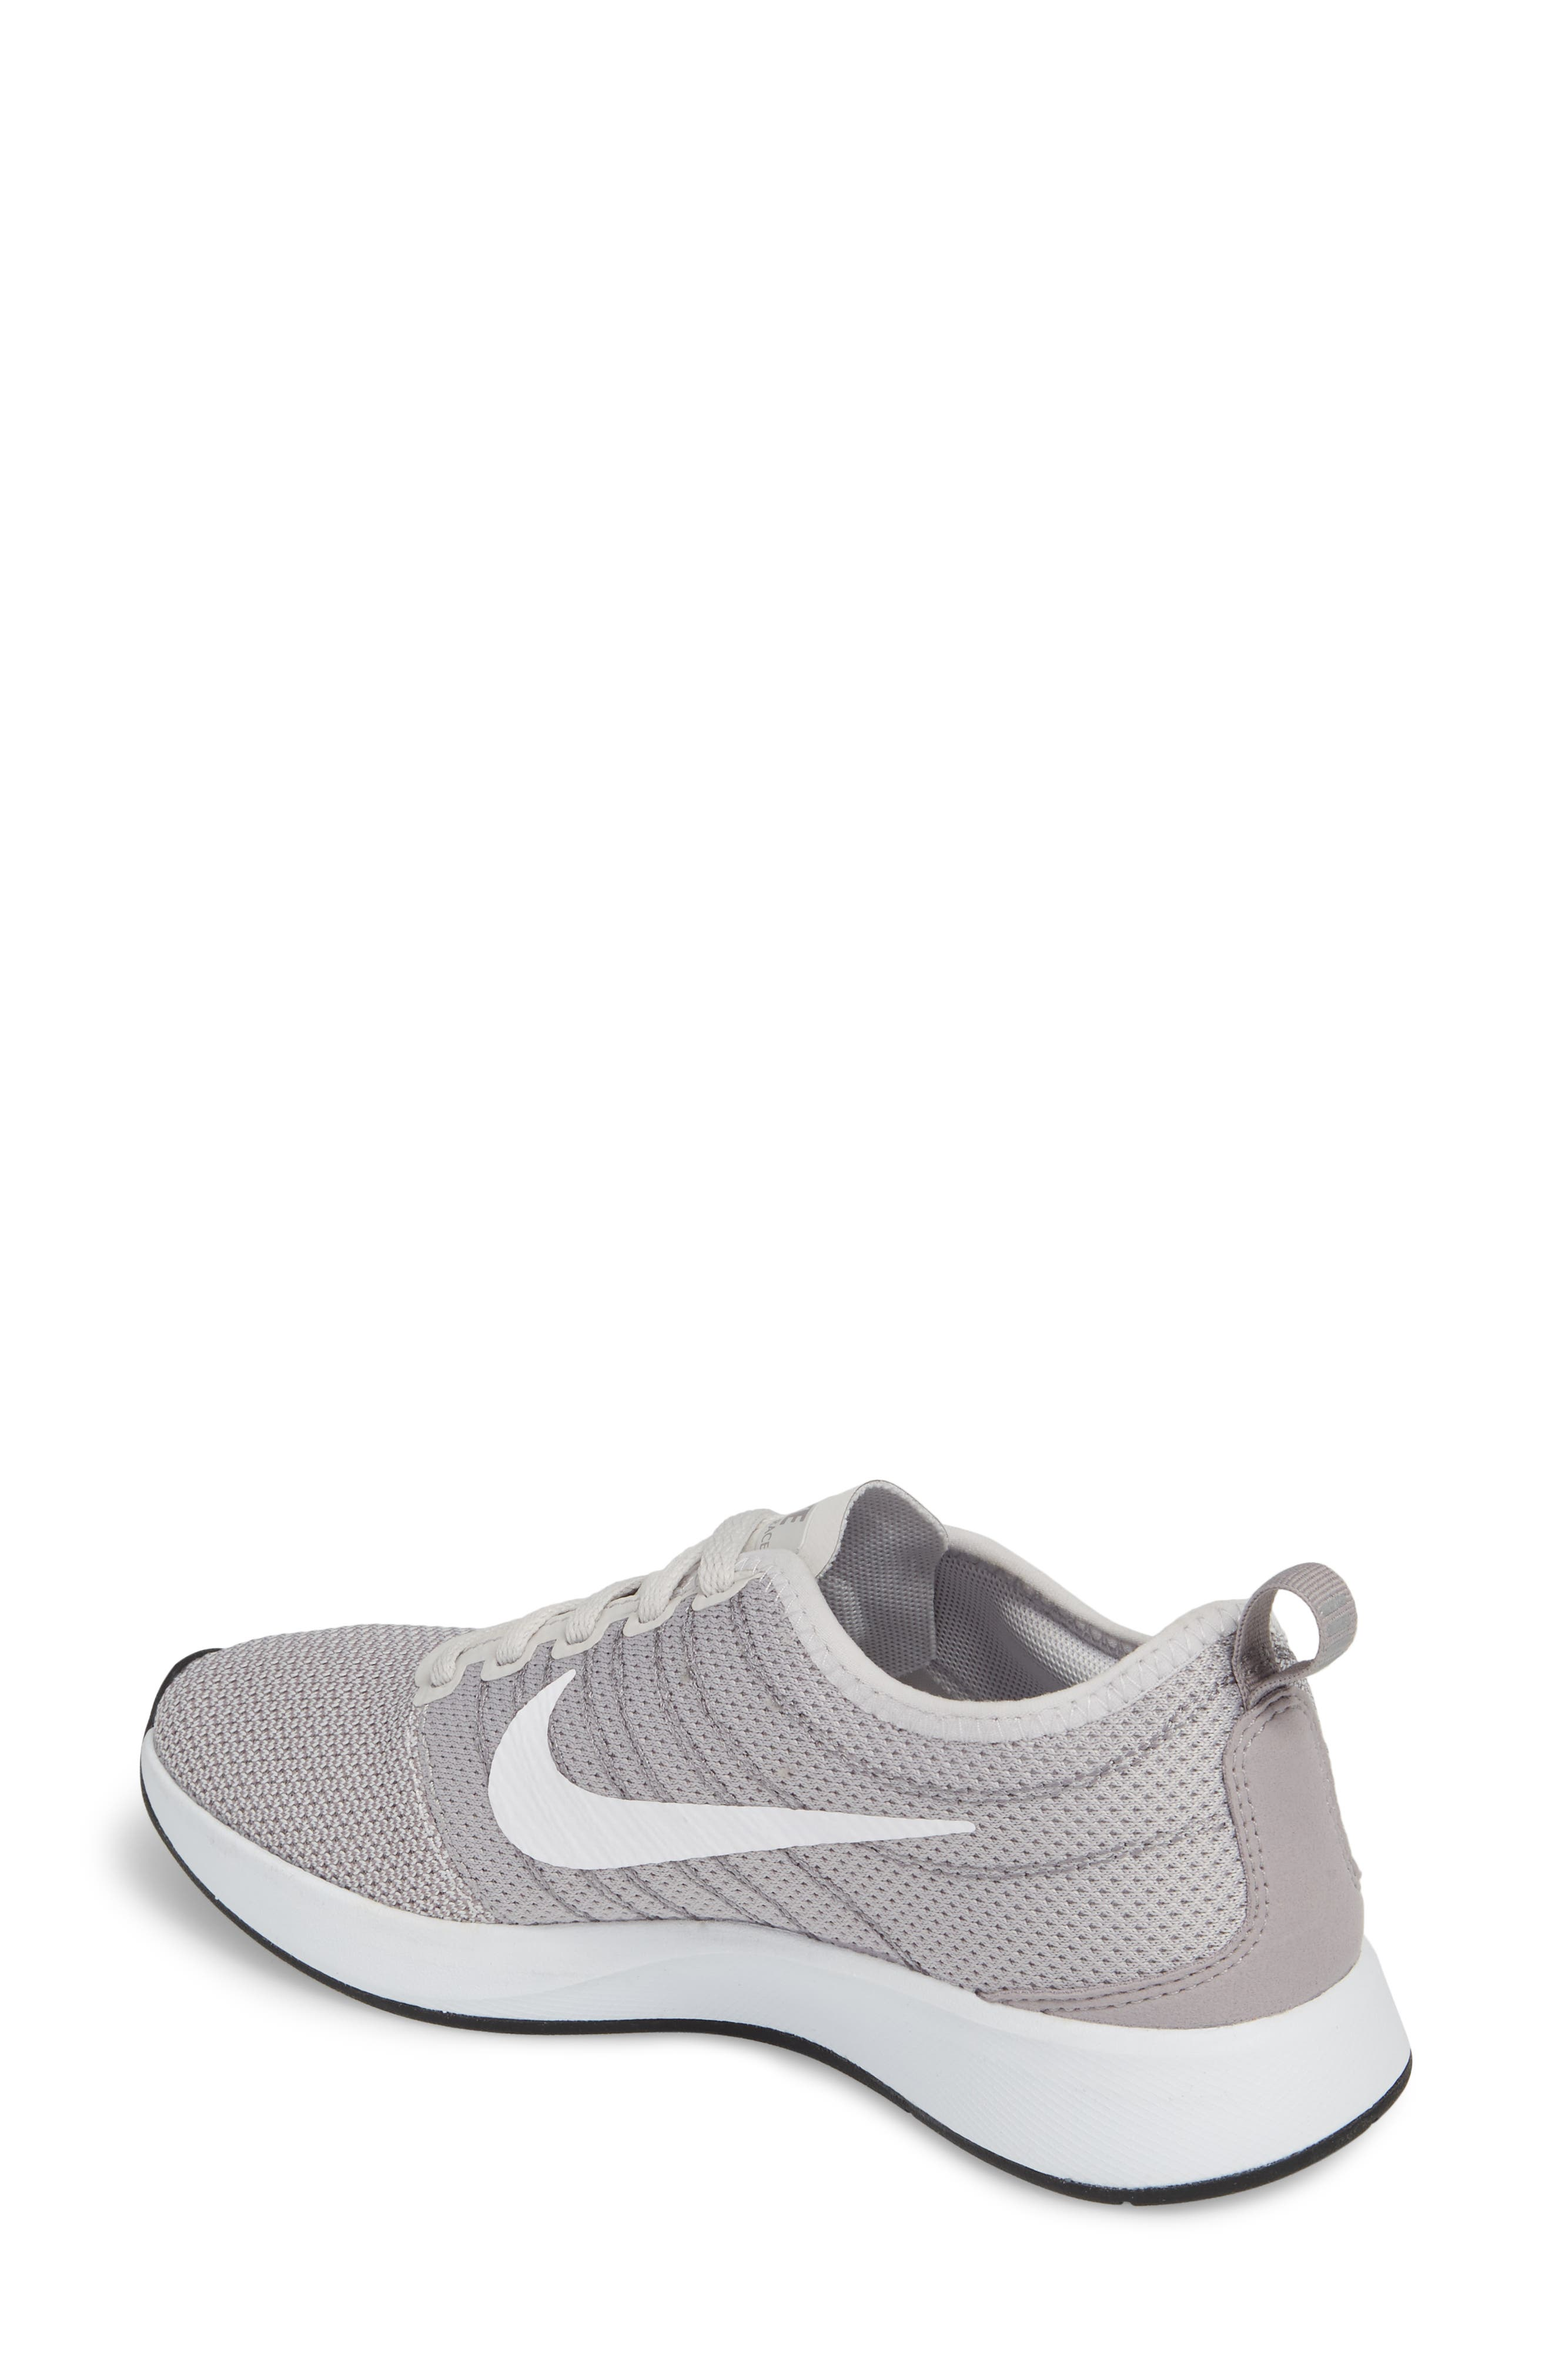 Dualtone Racer Running Shoe,                             Alternate thumbnail 2, color,                             026